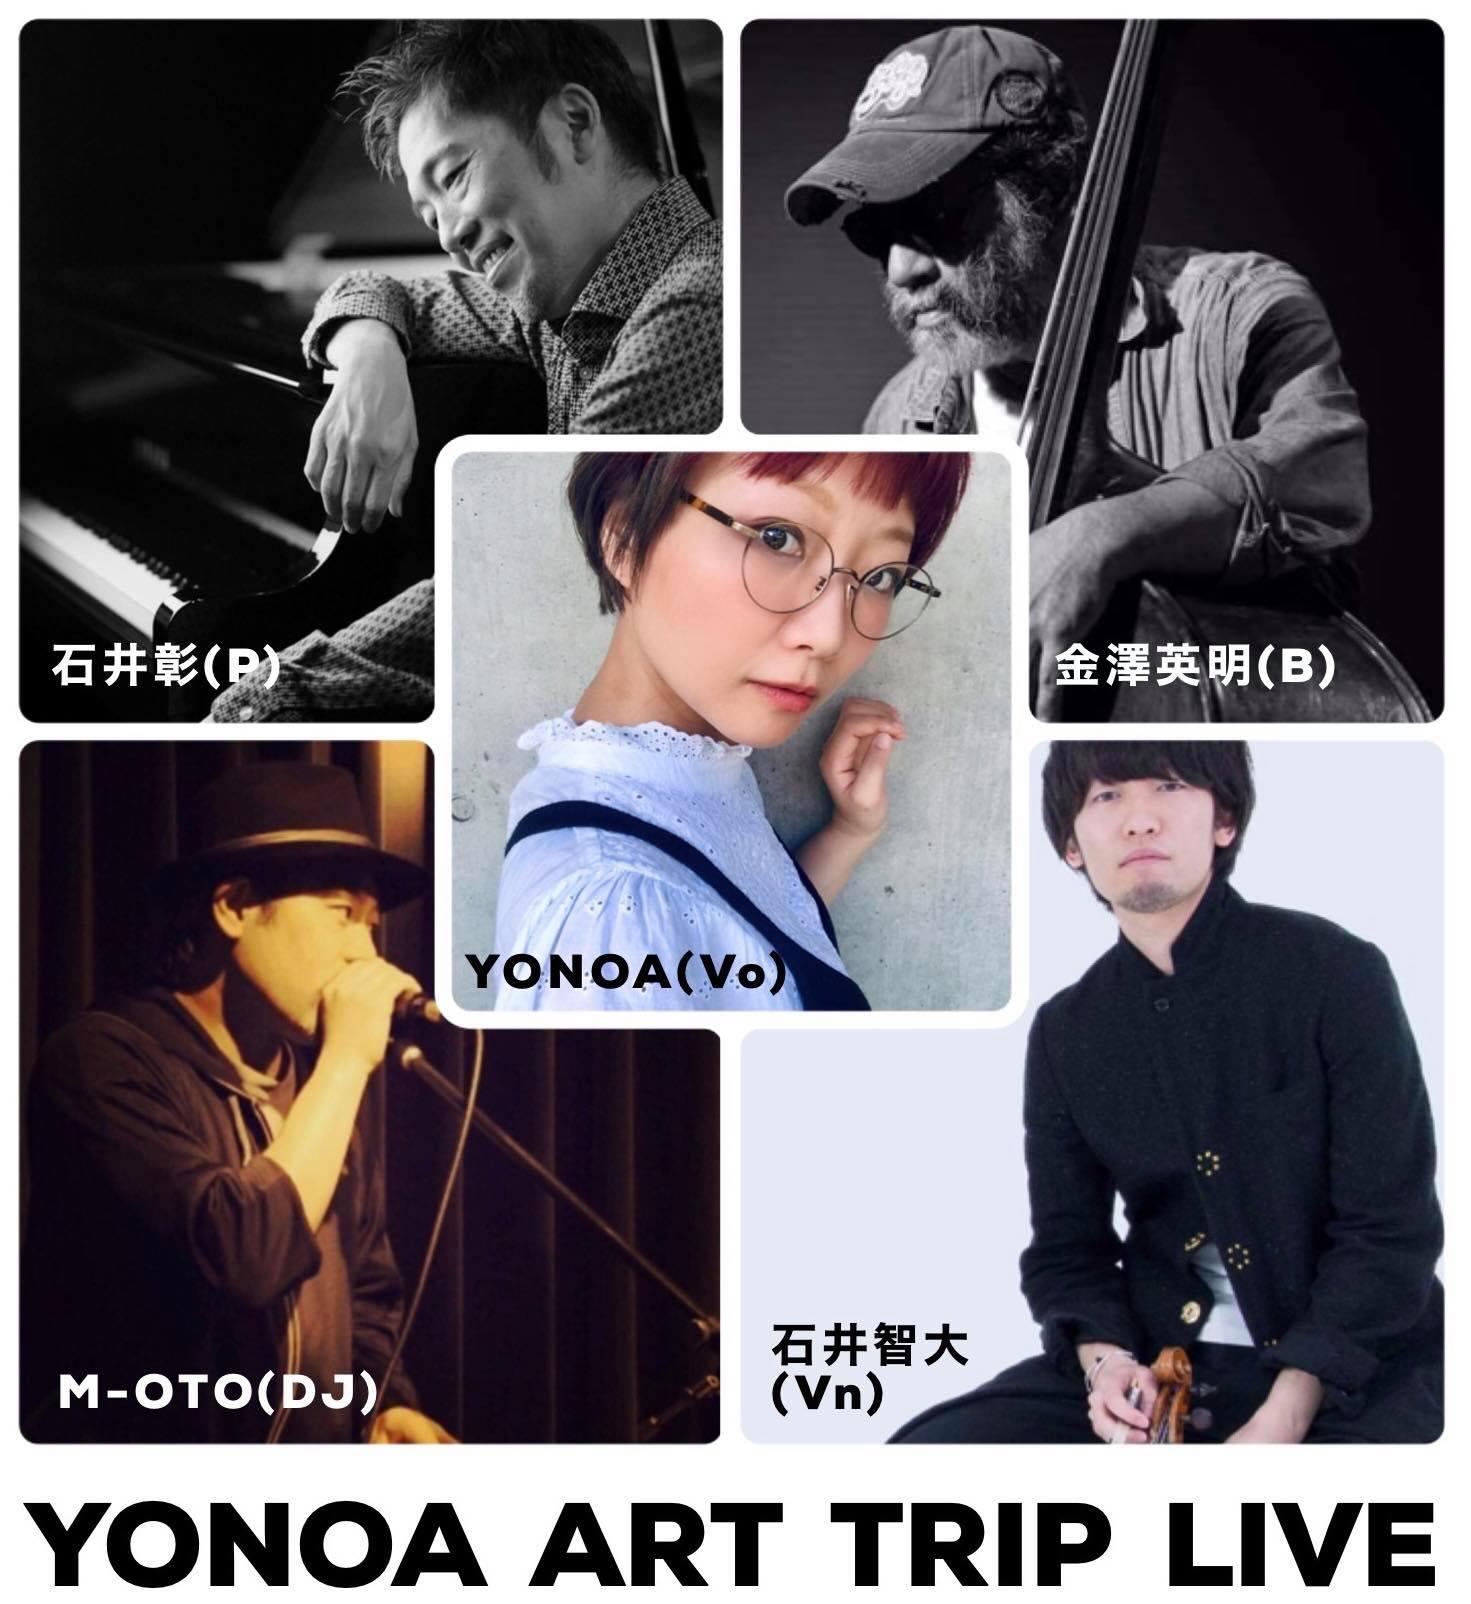 【配信】YONOA ART TRIP LIVE 2020